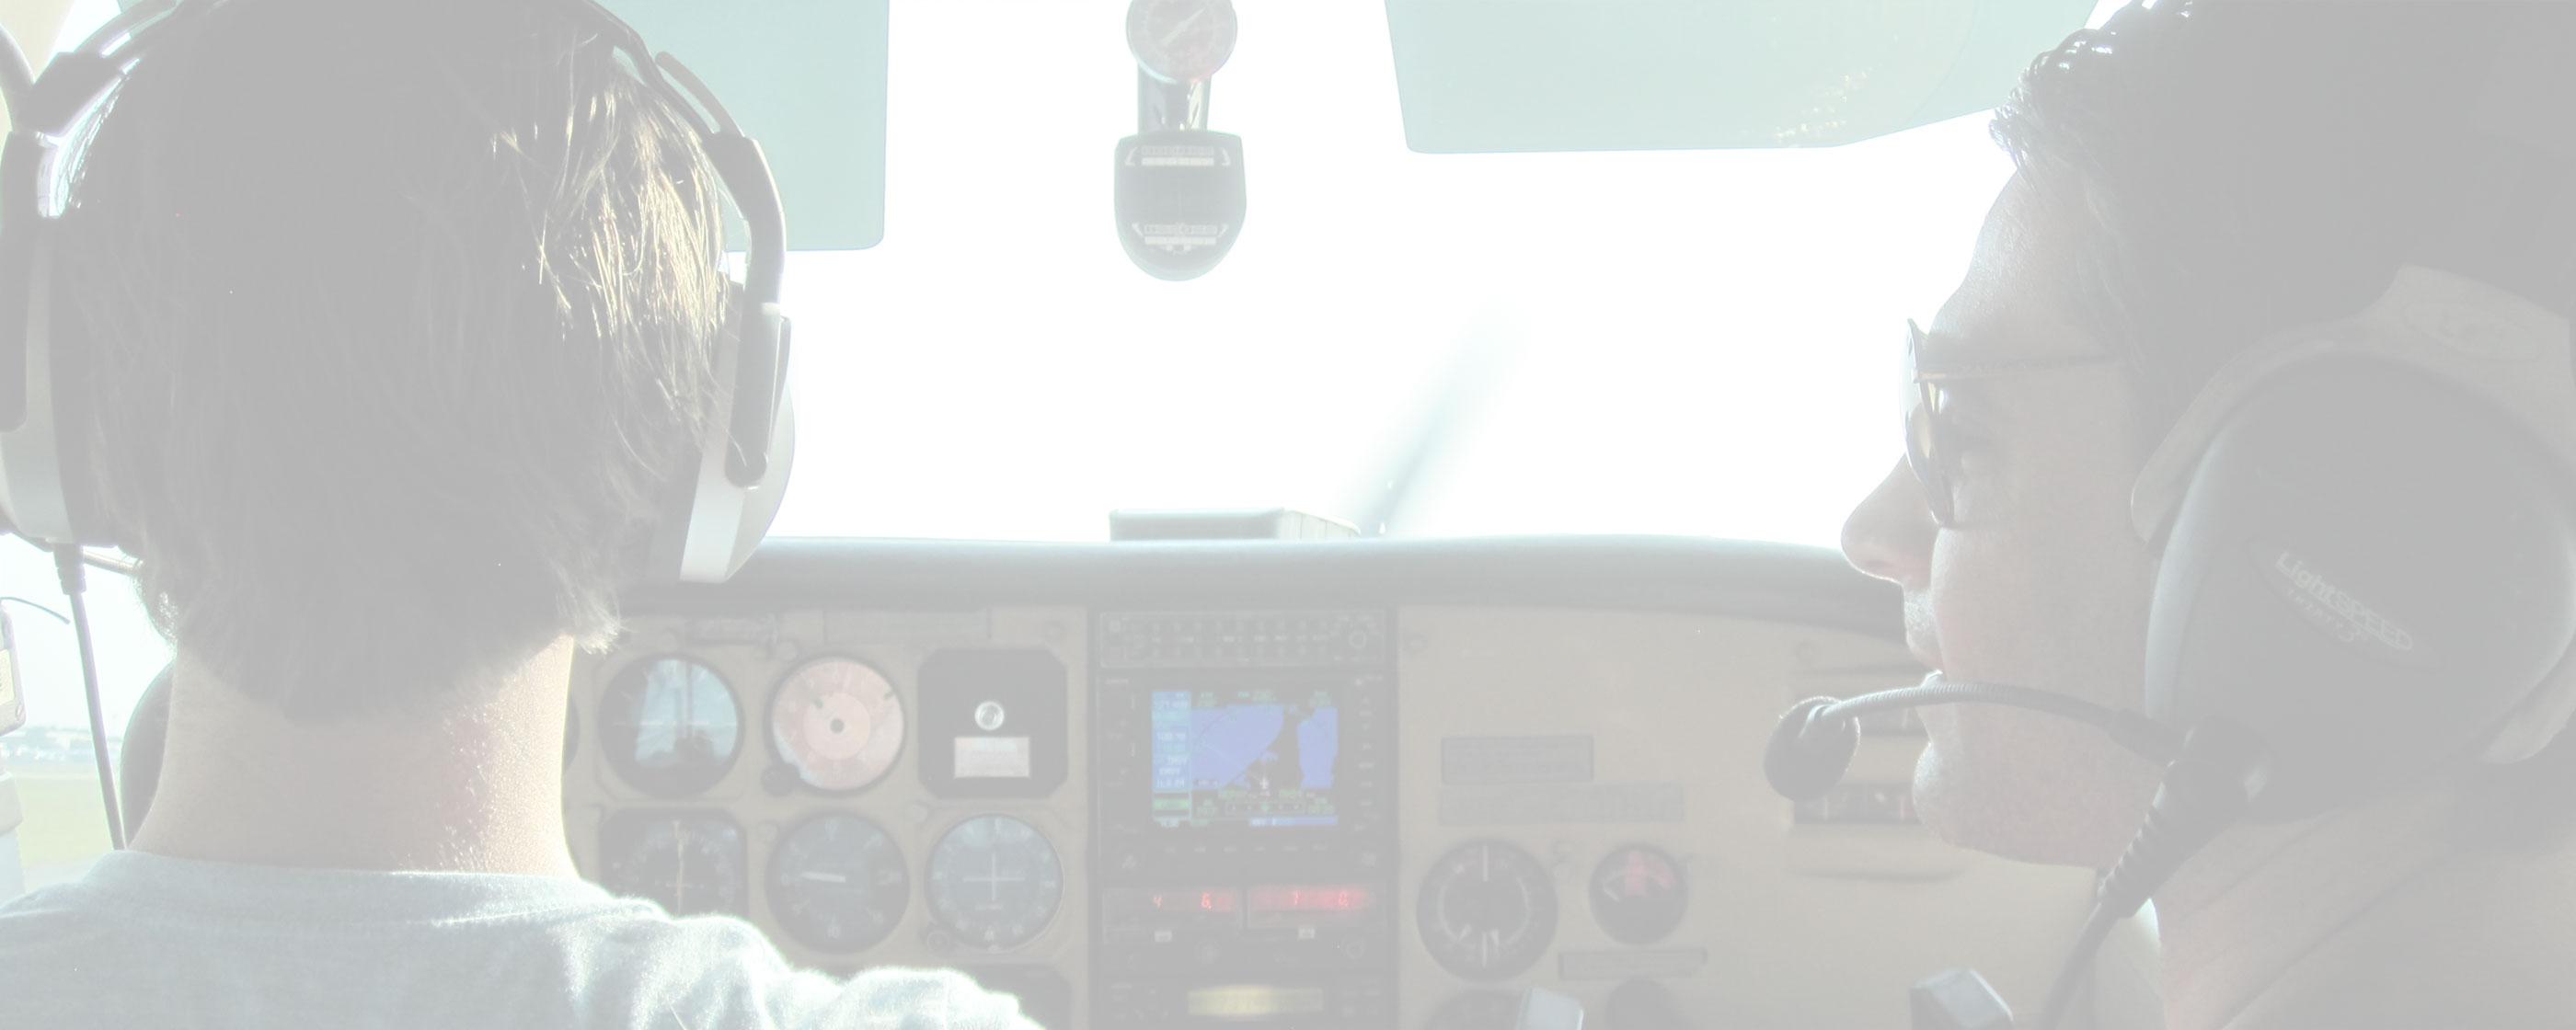 Flight Instructor Coaching New Pilot